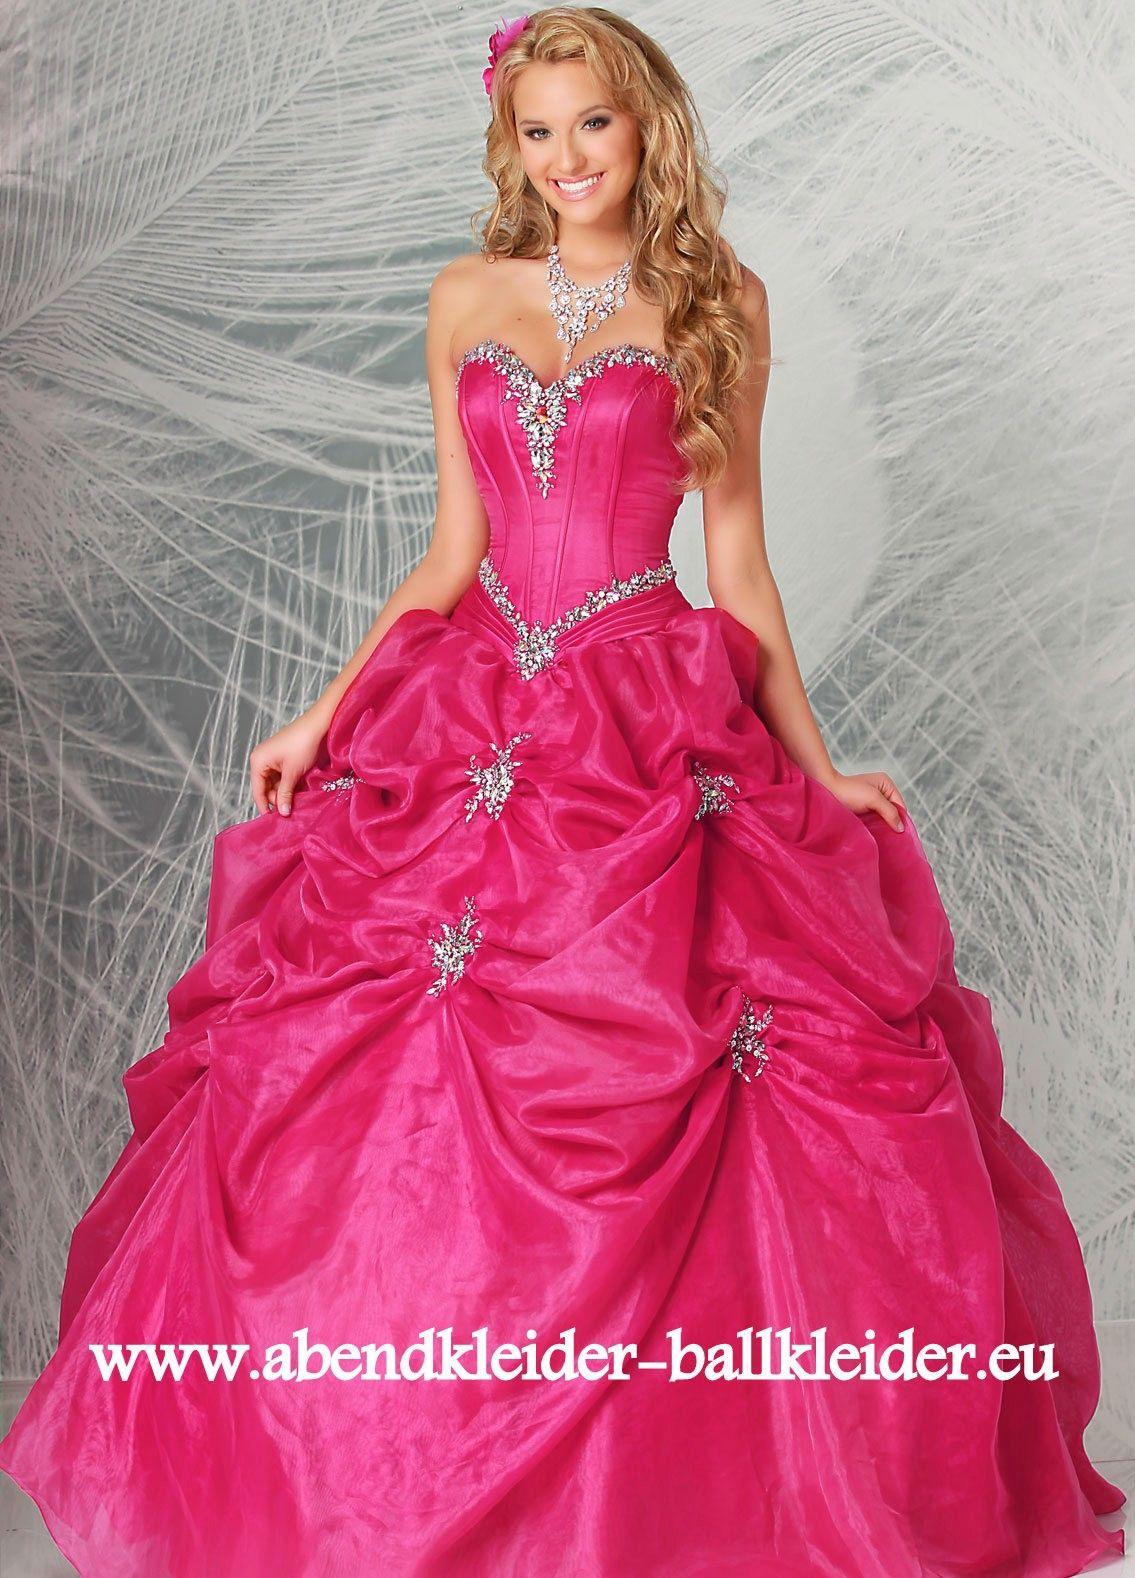 13 Elegant Abend Dress Online Bester Preis15 Genial Abend Dress Online Stylish